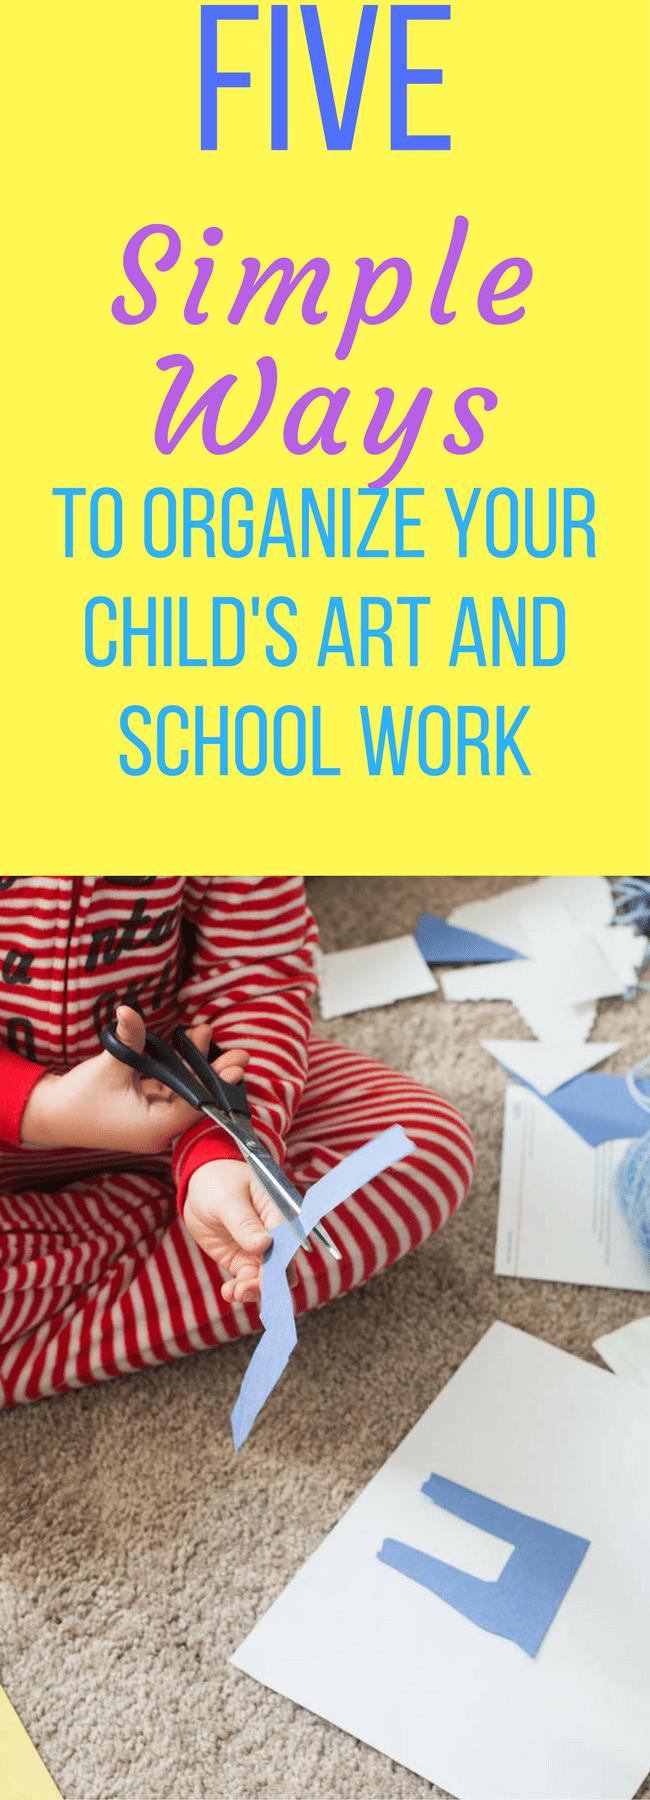 Organize artwork / organize kid's papers / organization / back to school / school organization / preschool tips / homeschool / organize home via @clarkscondensed